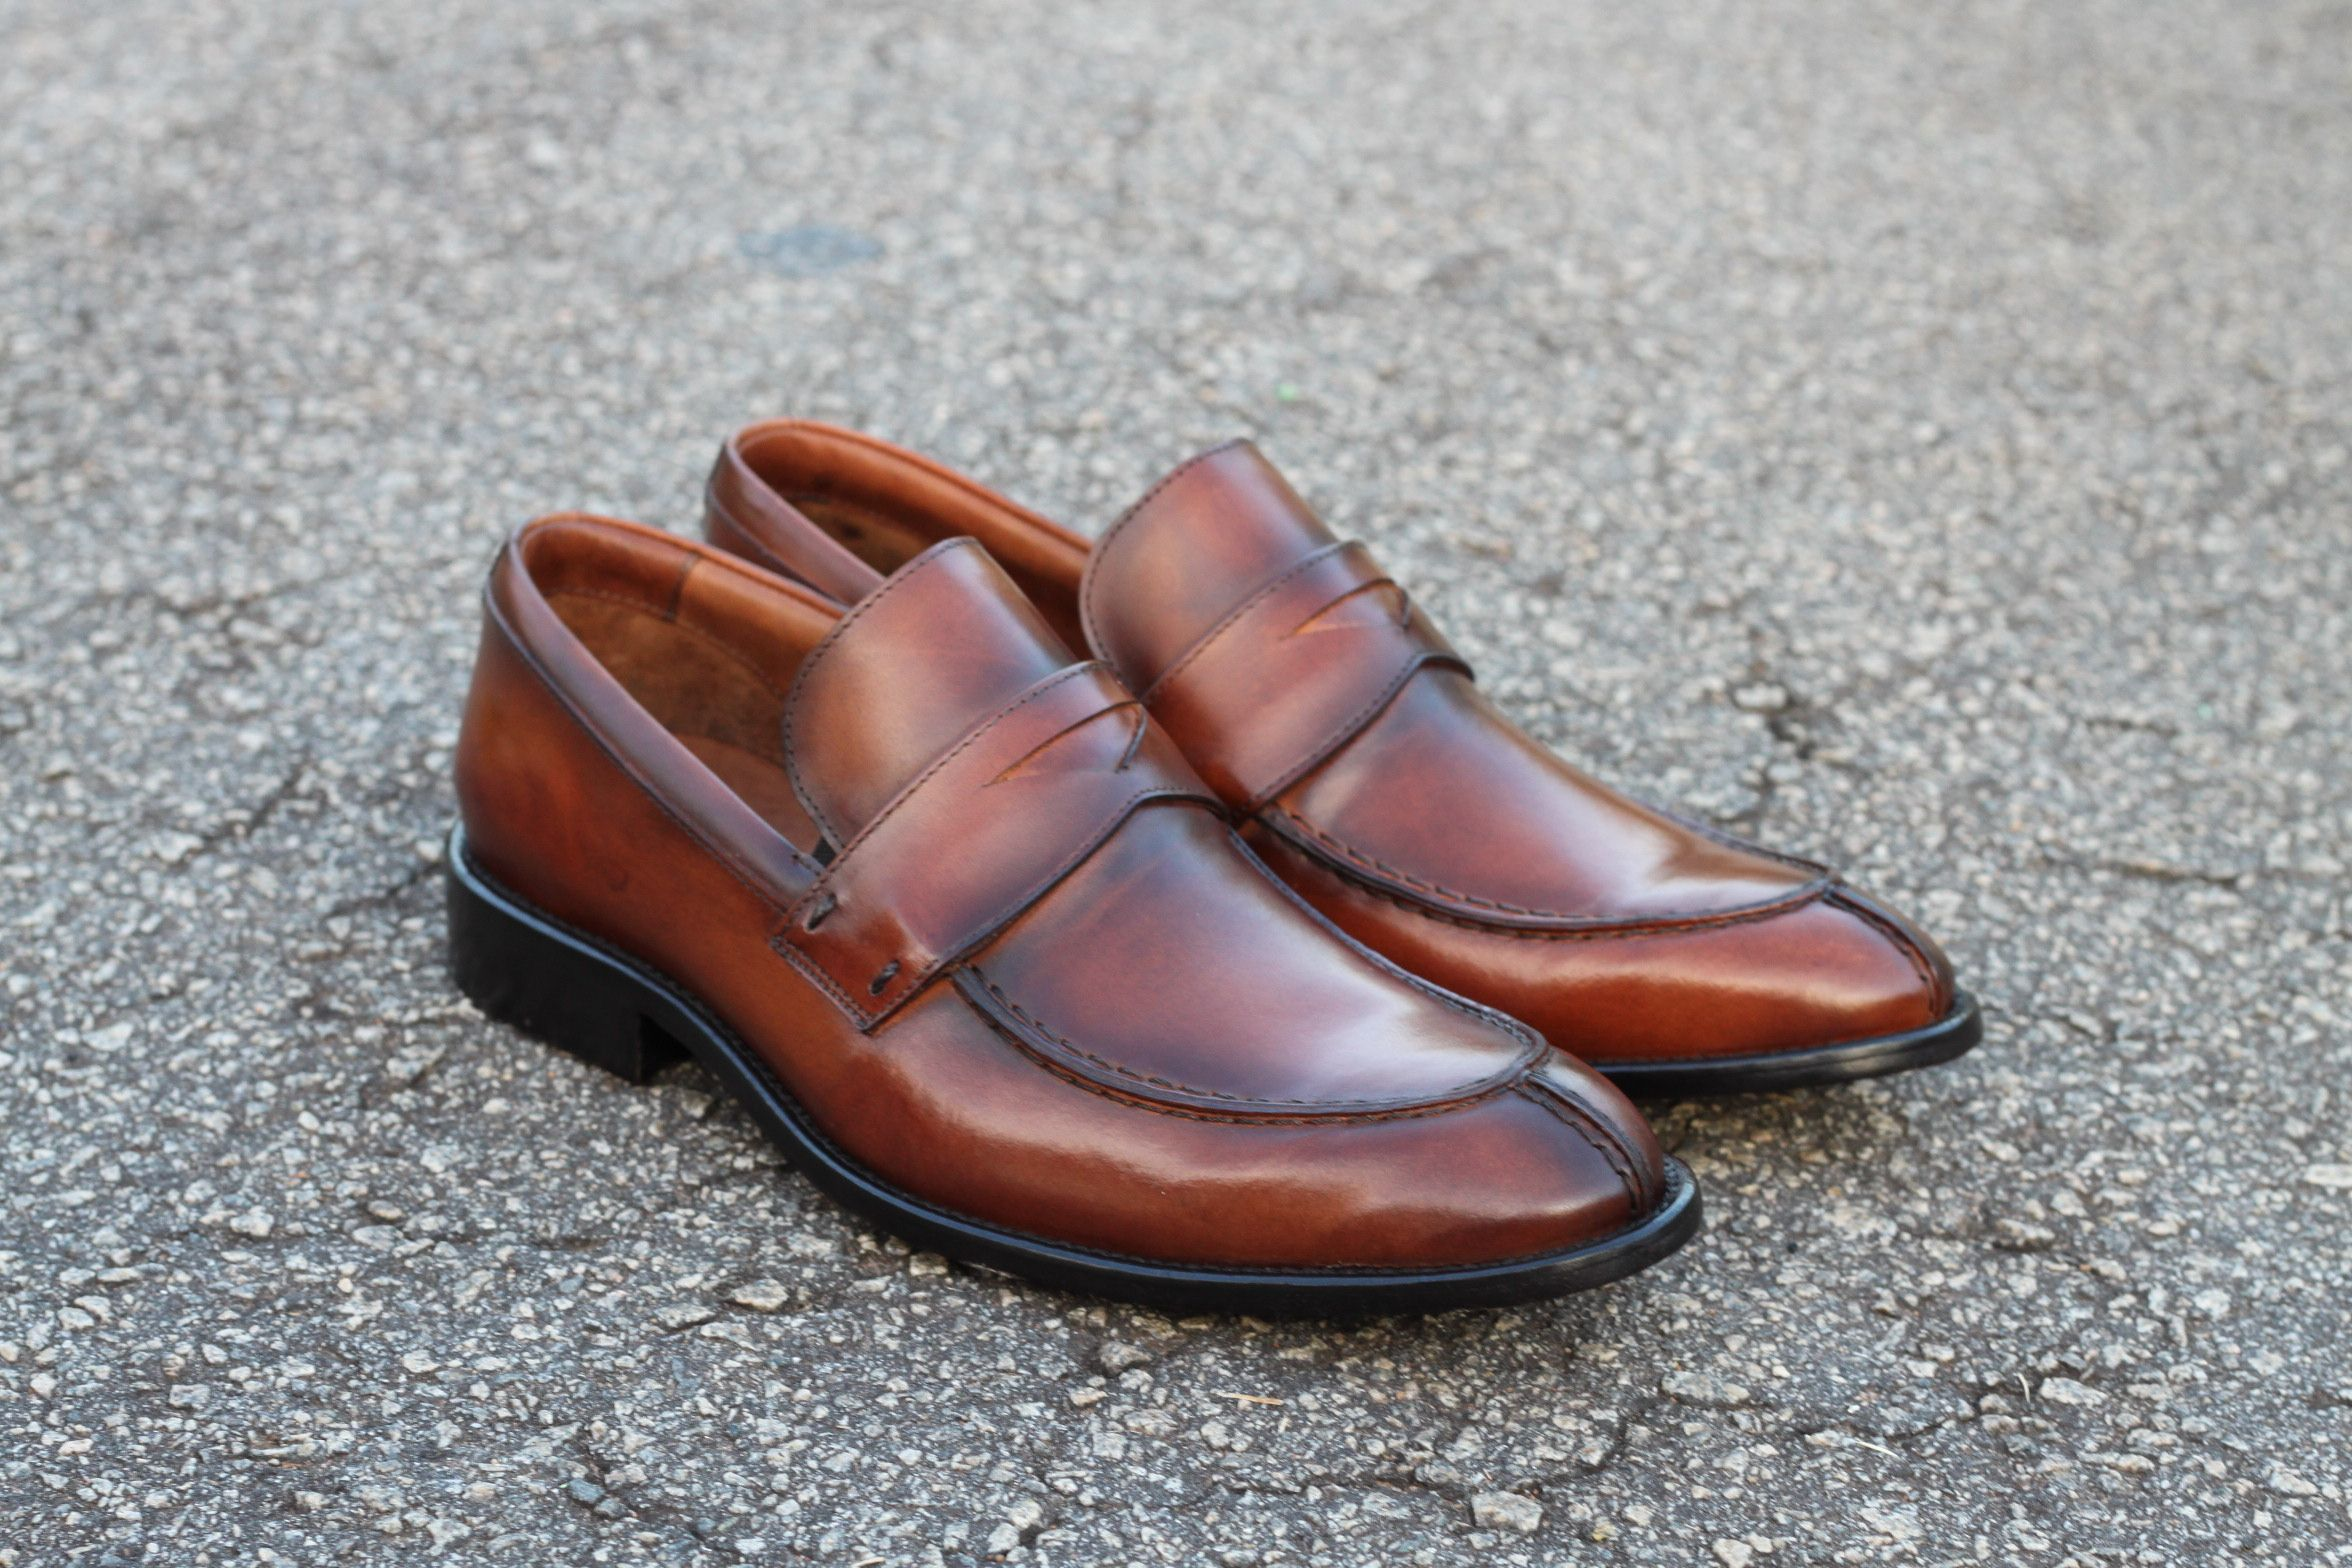 cf1cbaf0db Sapato Social Masculino Loafer CNS em couro cor Damasco